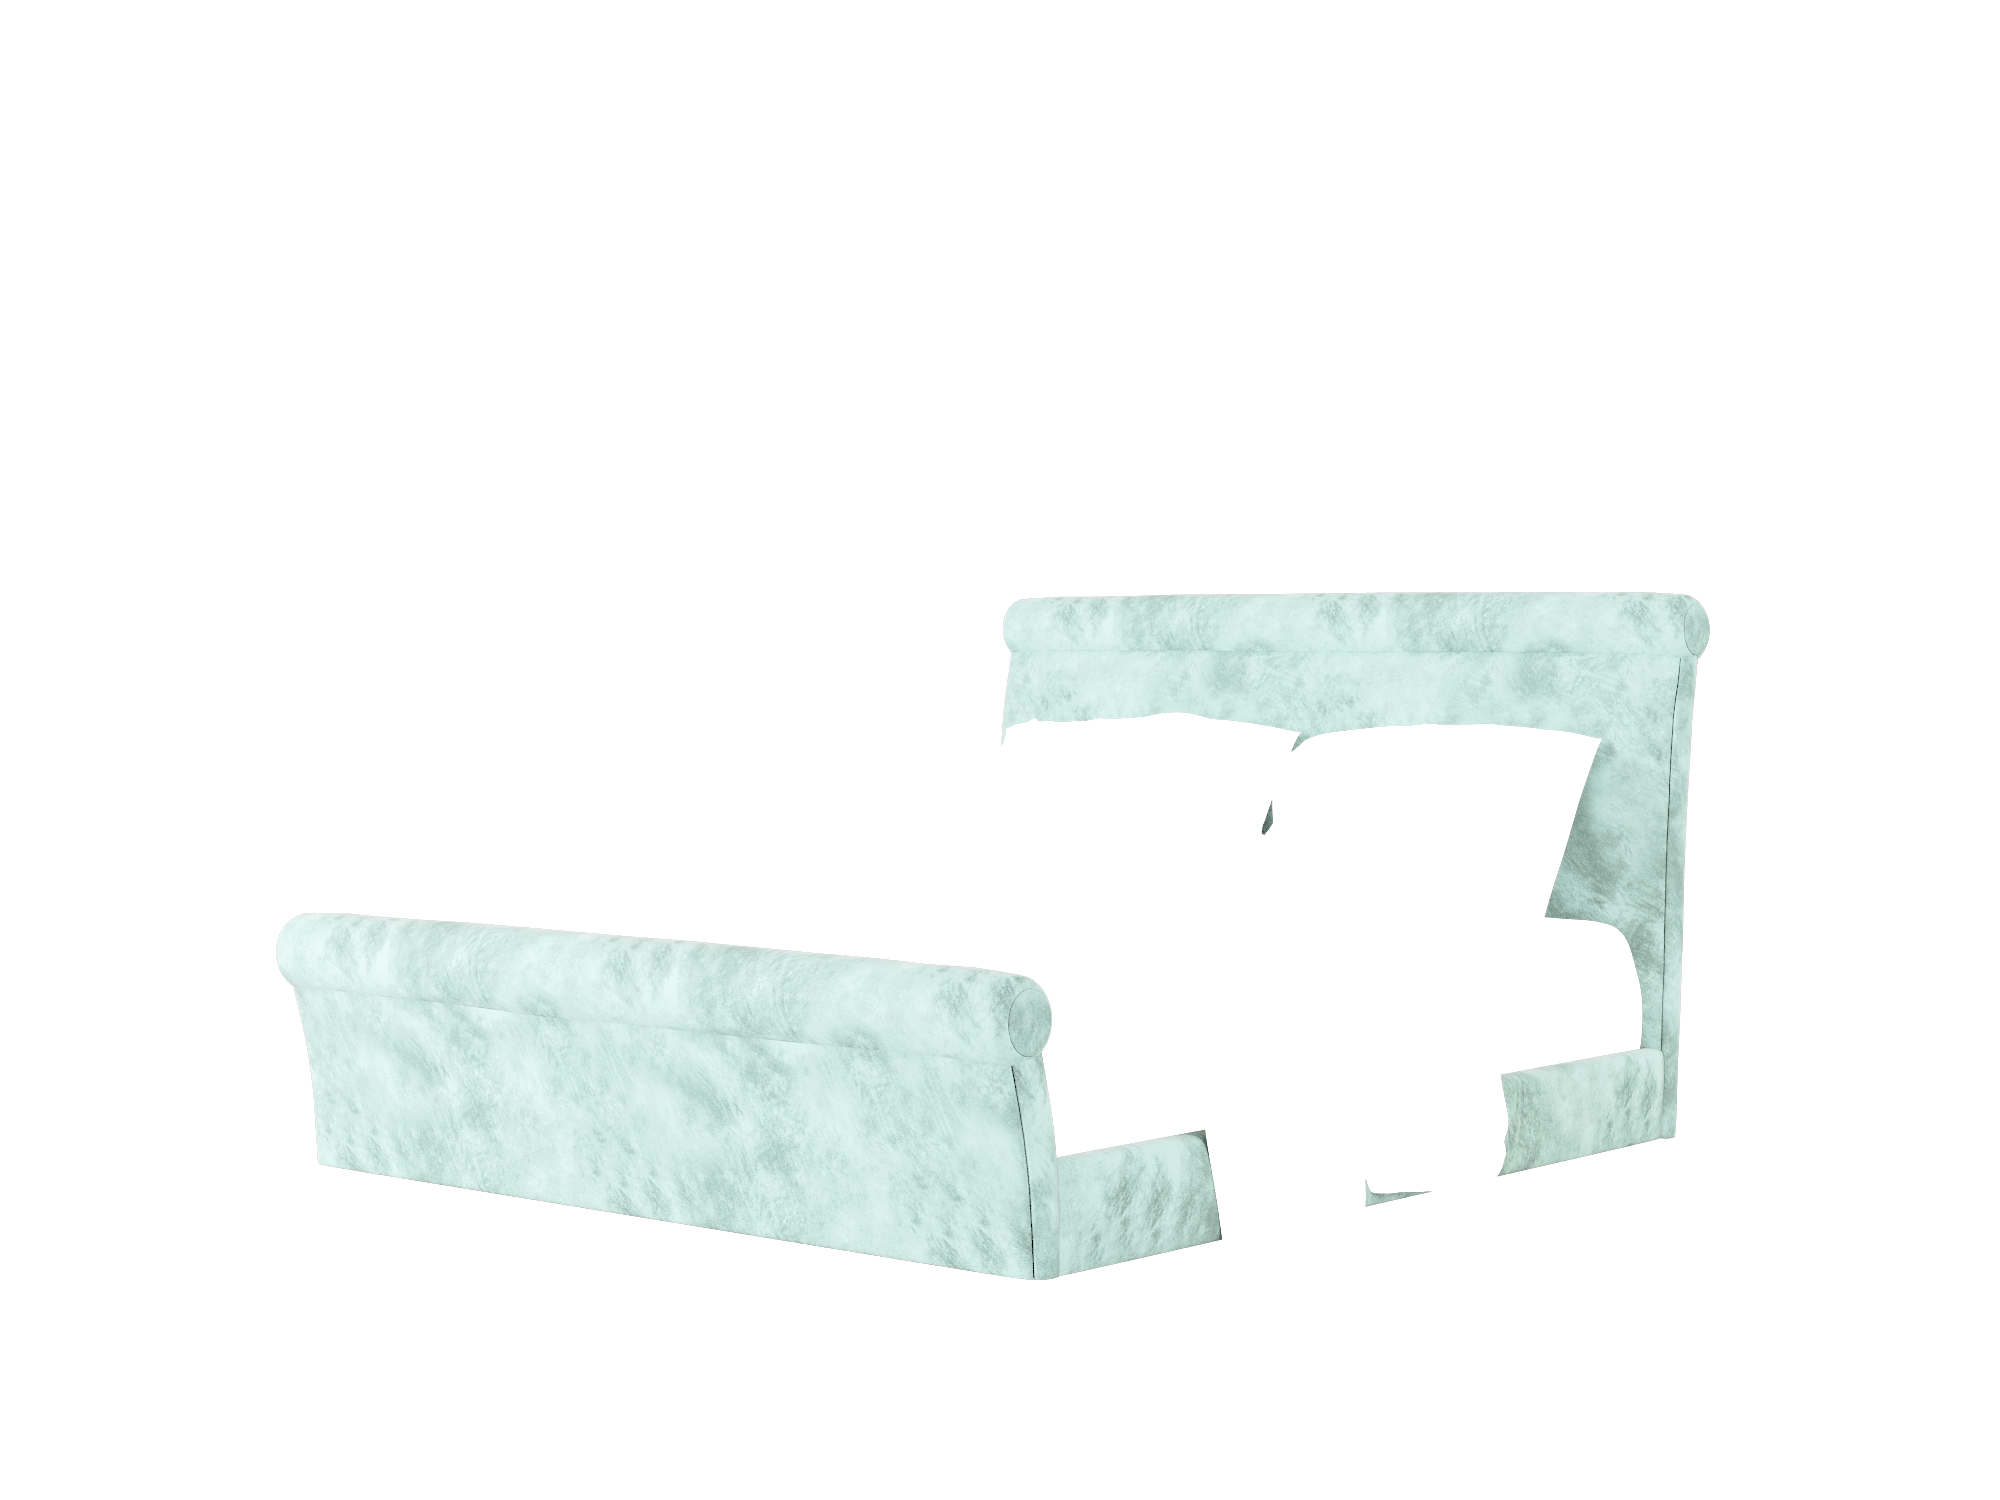 Maja Buzz Sky Bed King Room Texture